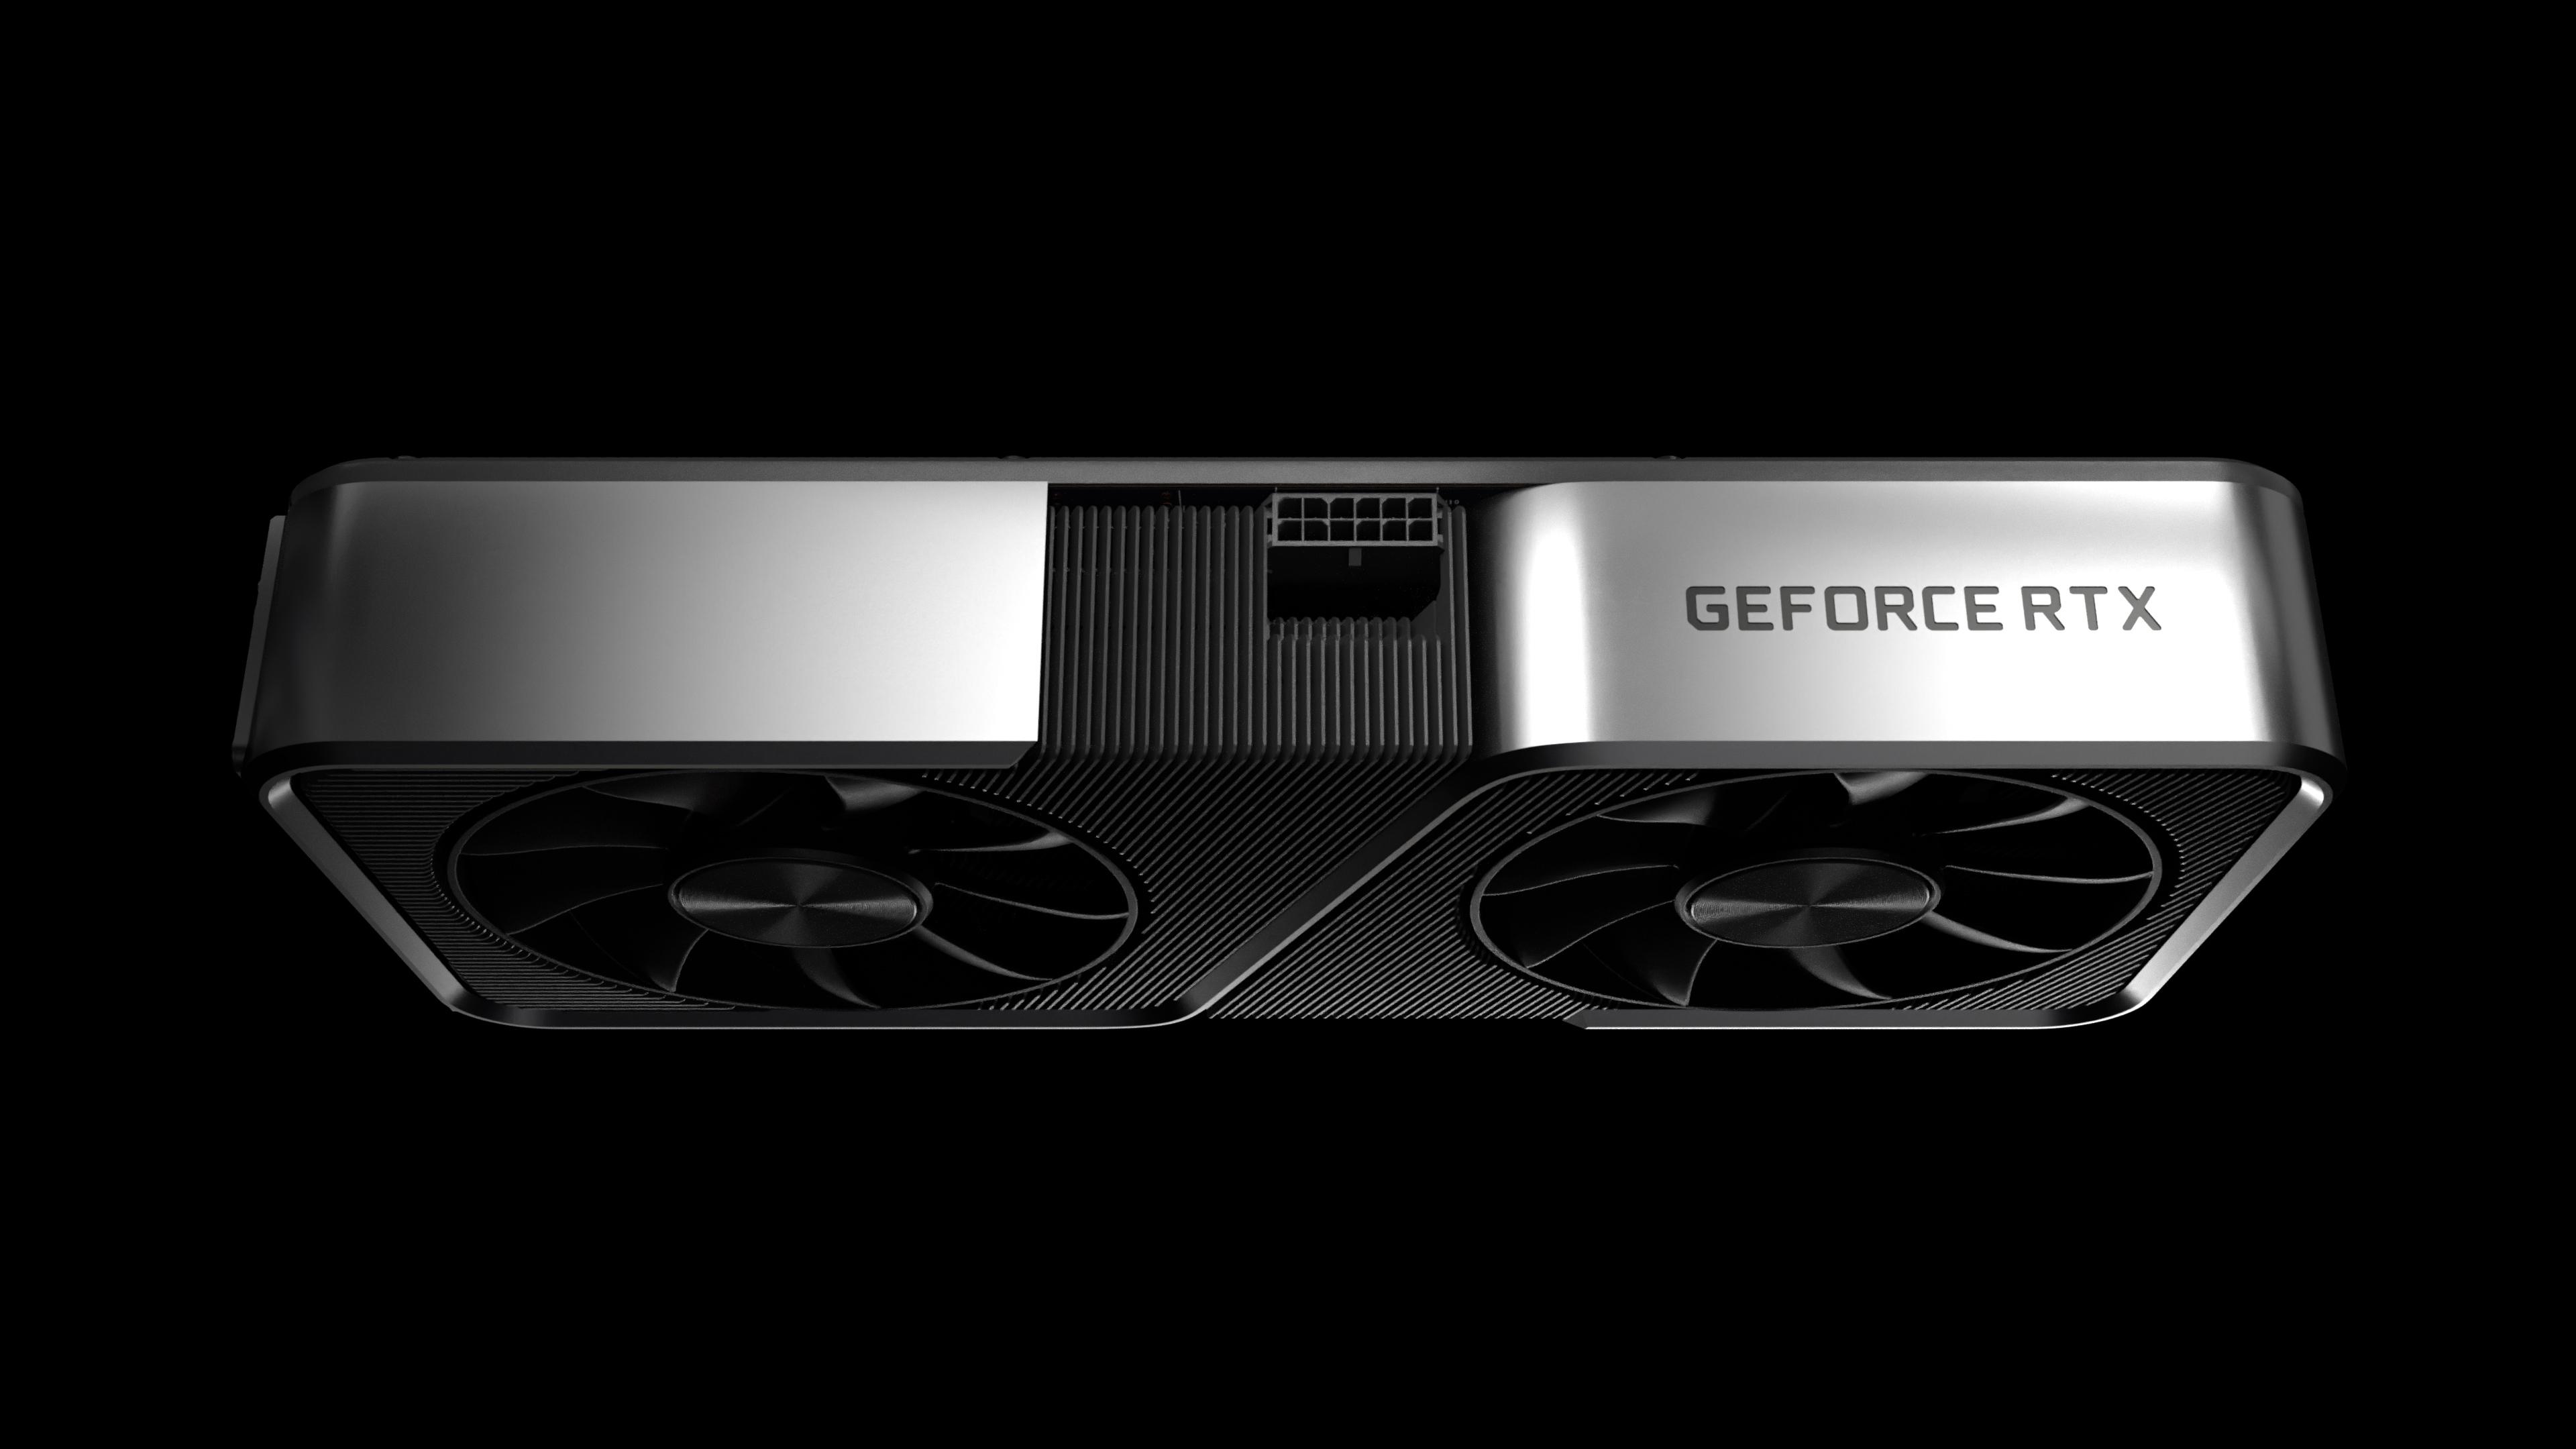 nvidia-geforce-rtx-3070-photo-001.jpg